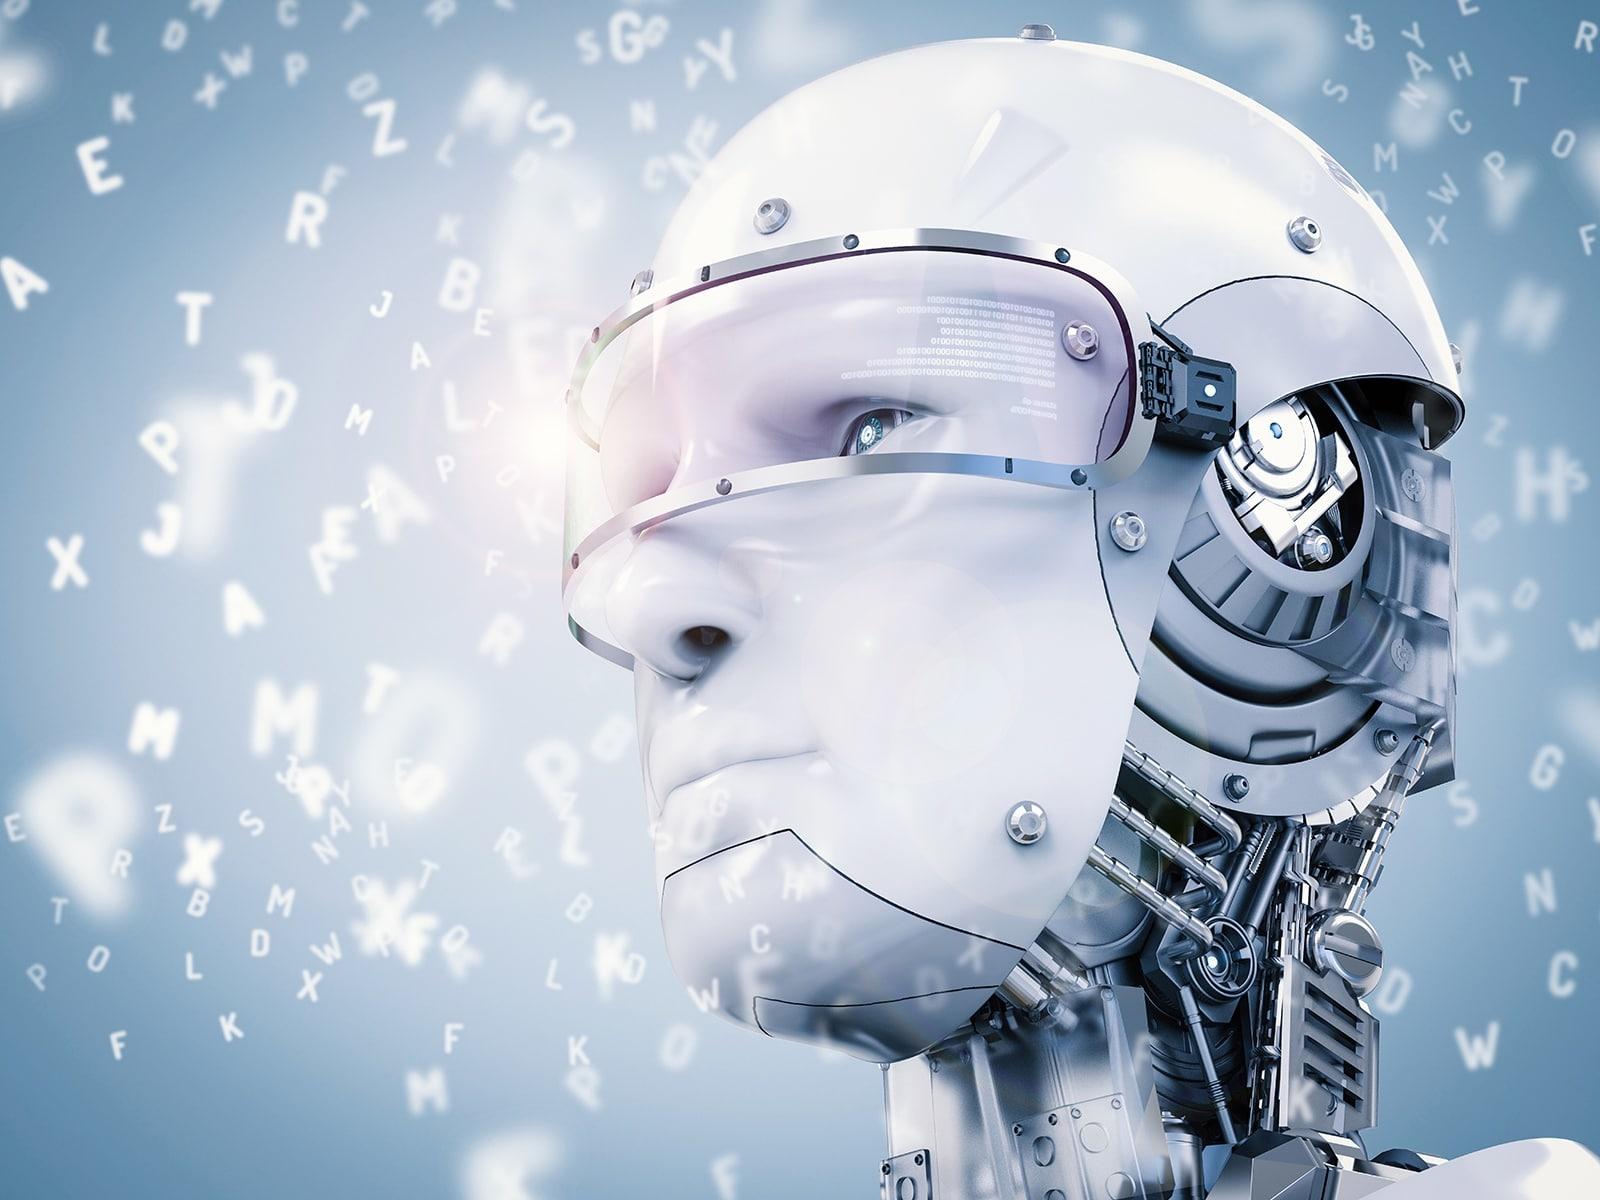 smeup machine learning come funziona